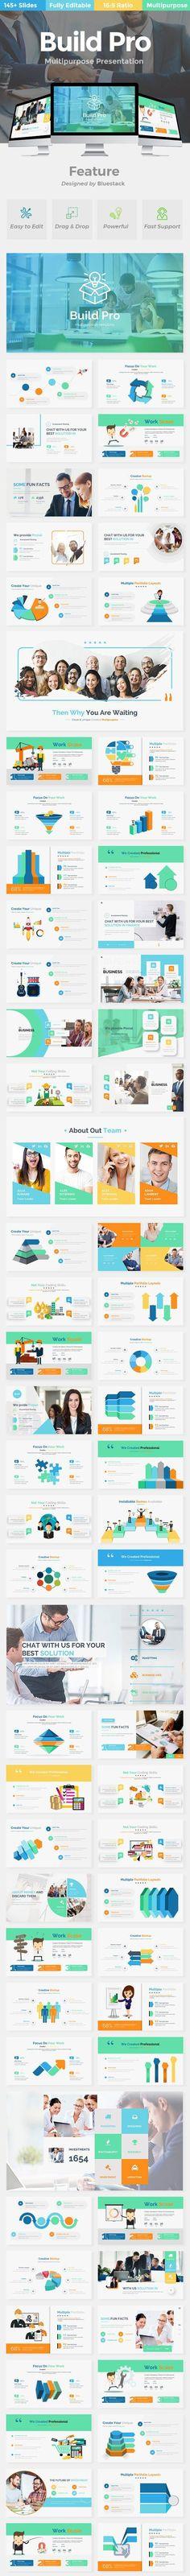 Build Pro Business Keynote Template - Keynote Business Presentation Template by bluestack. Business Presentation Templates, Business Powerpoint Templates, Keynote Template, Presentation Design, Building, Swot Analysis, Set Design, Graphic